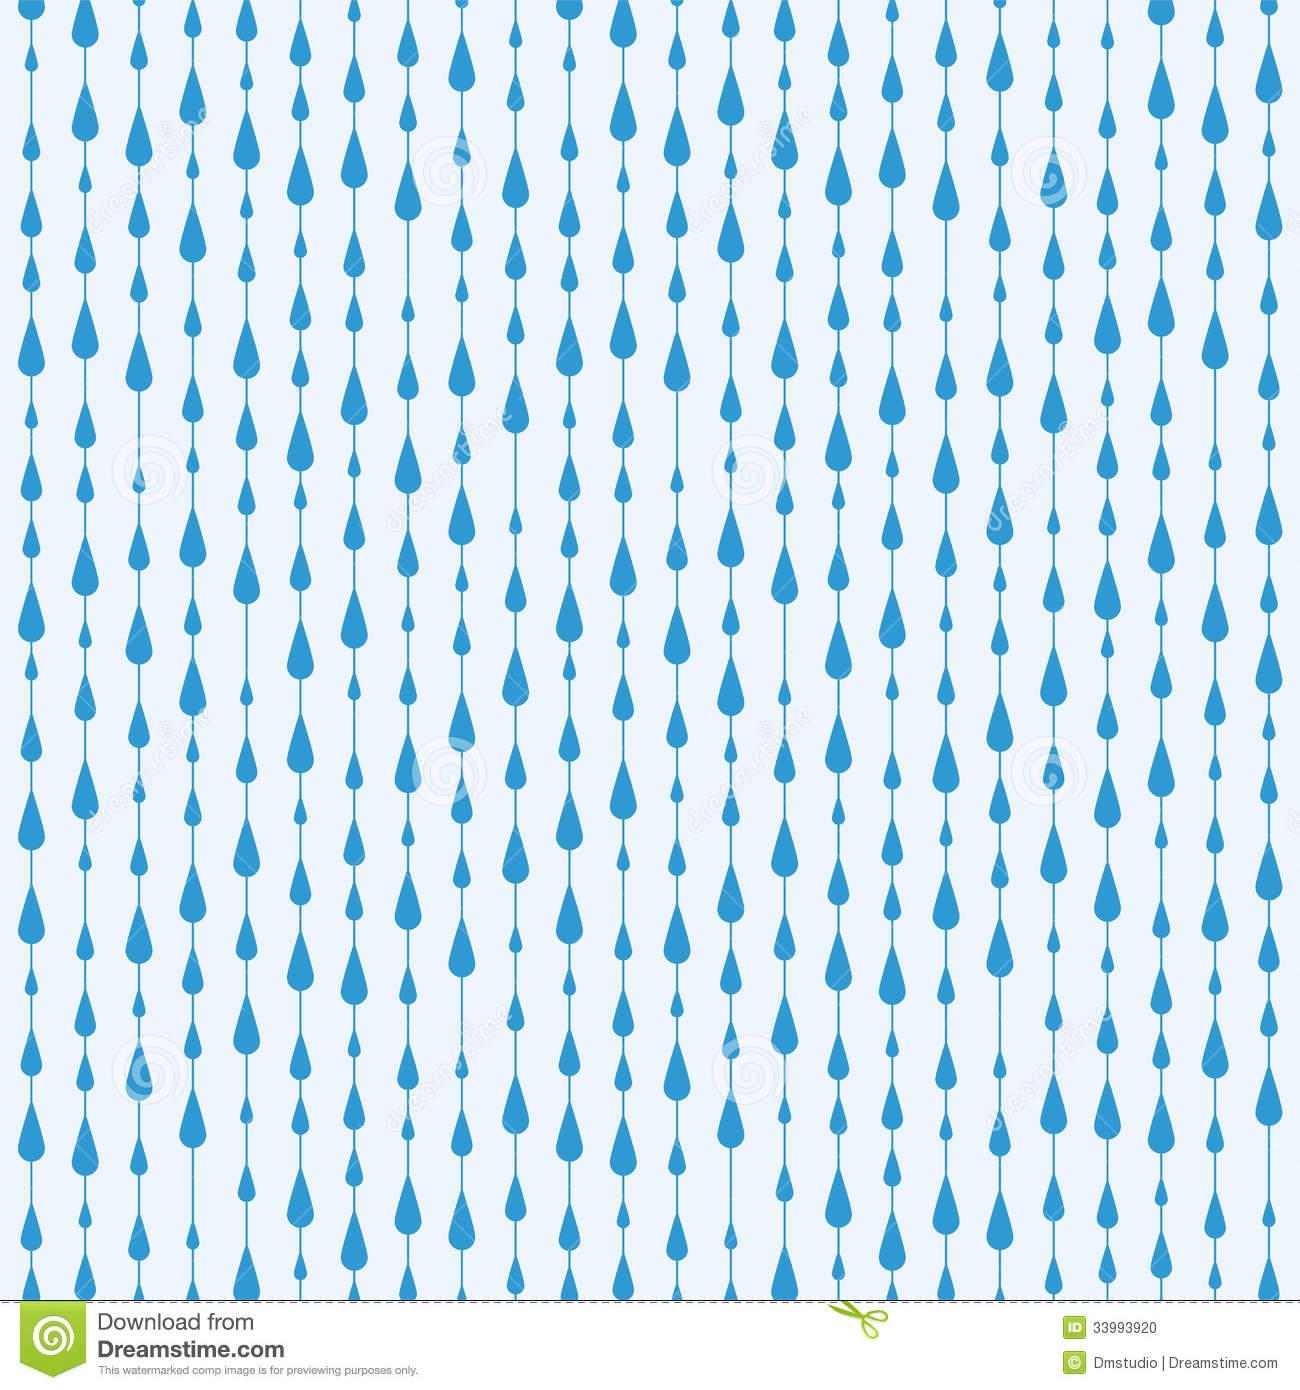 Rain falling clipart.